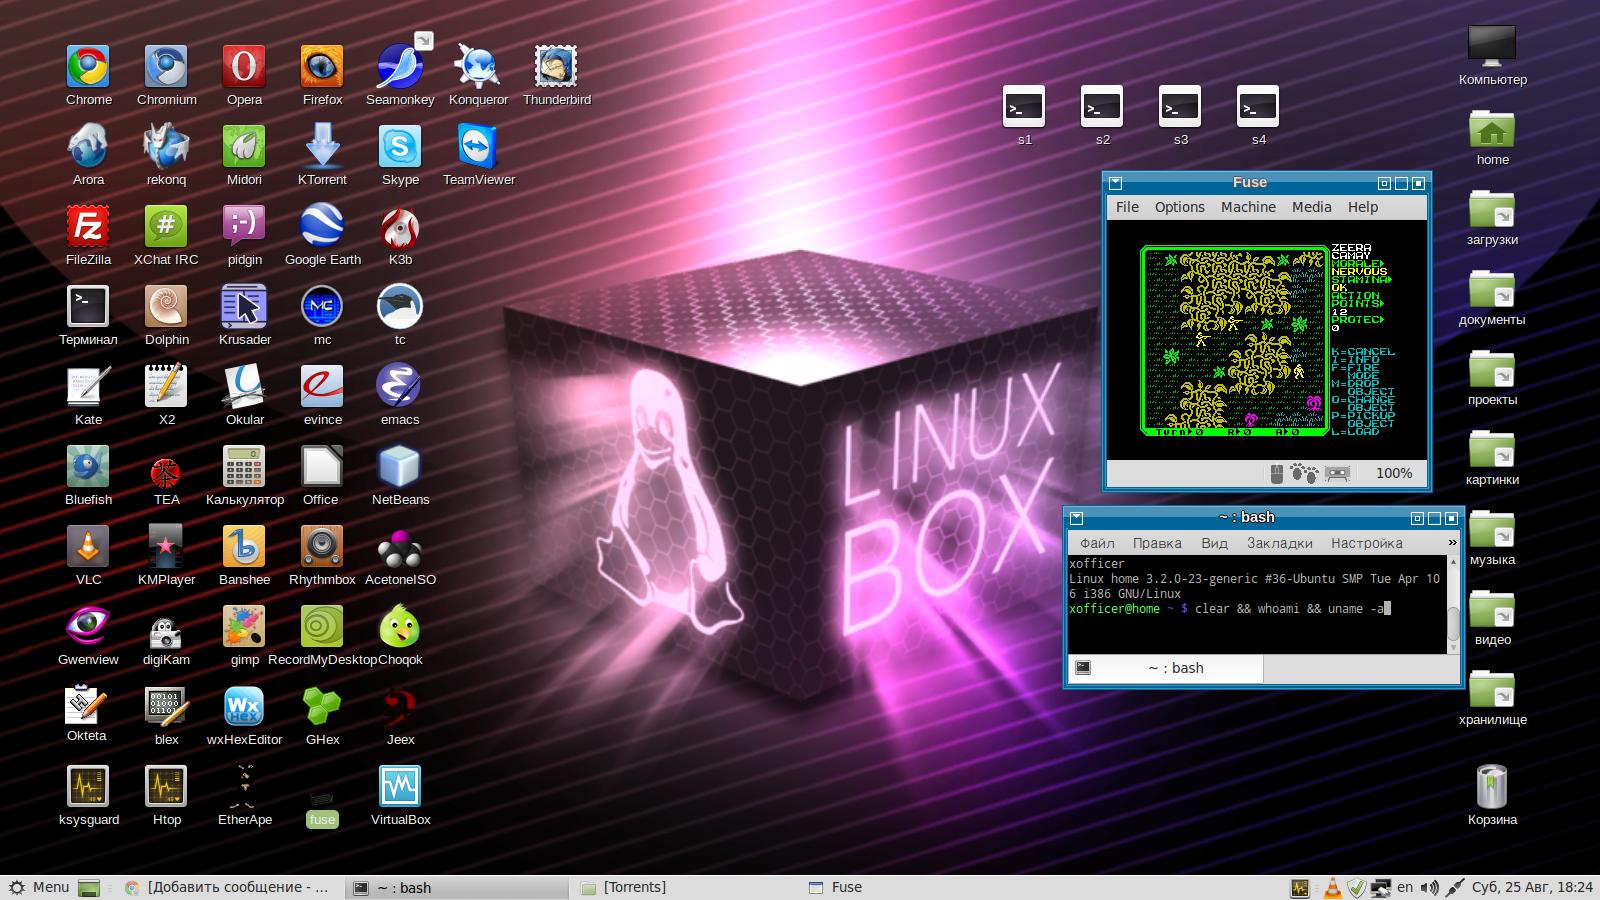 Ubuntu windows 7 style